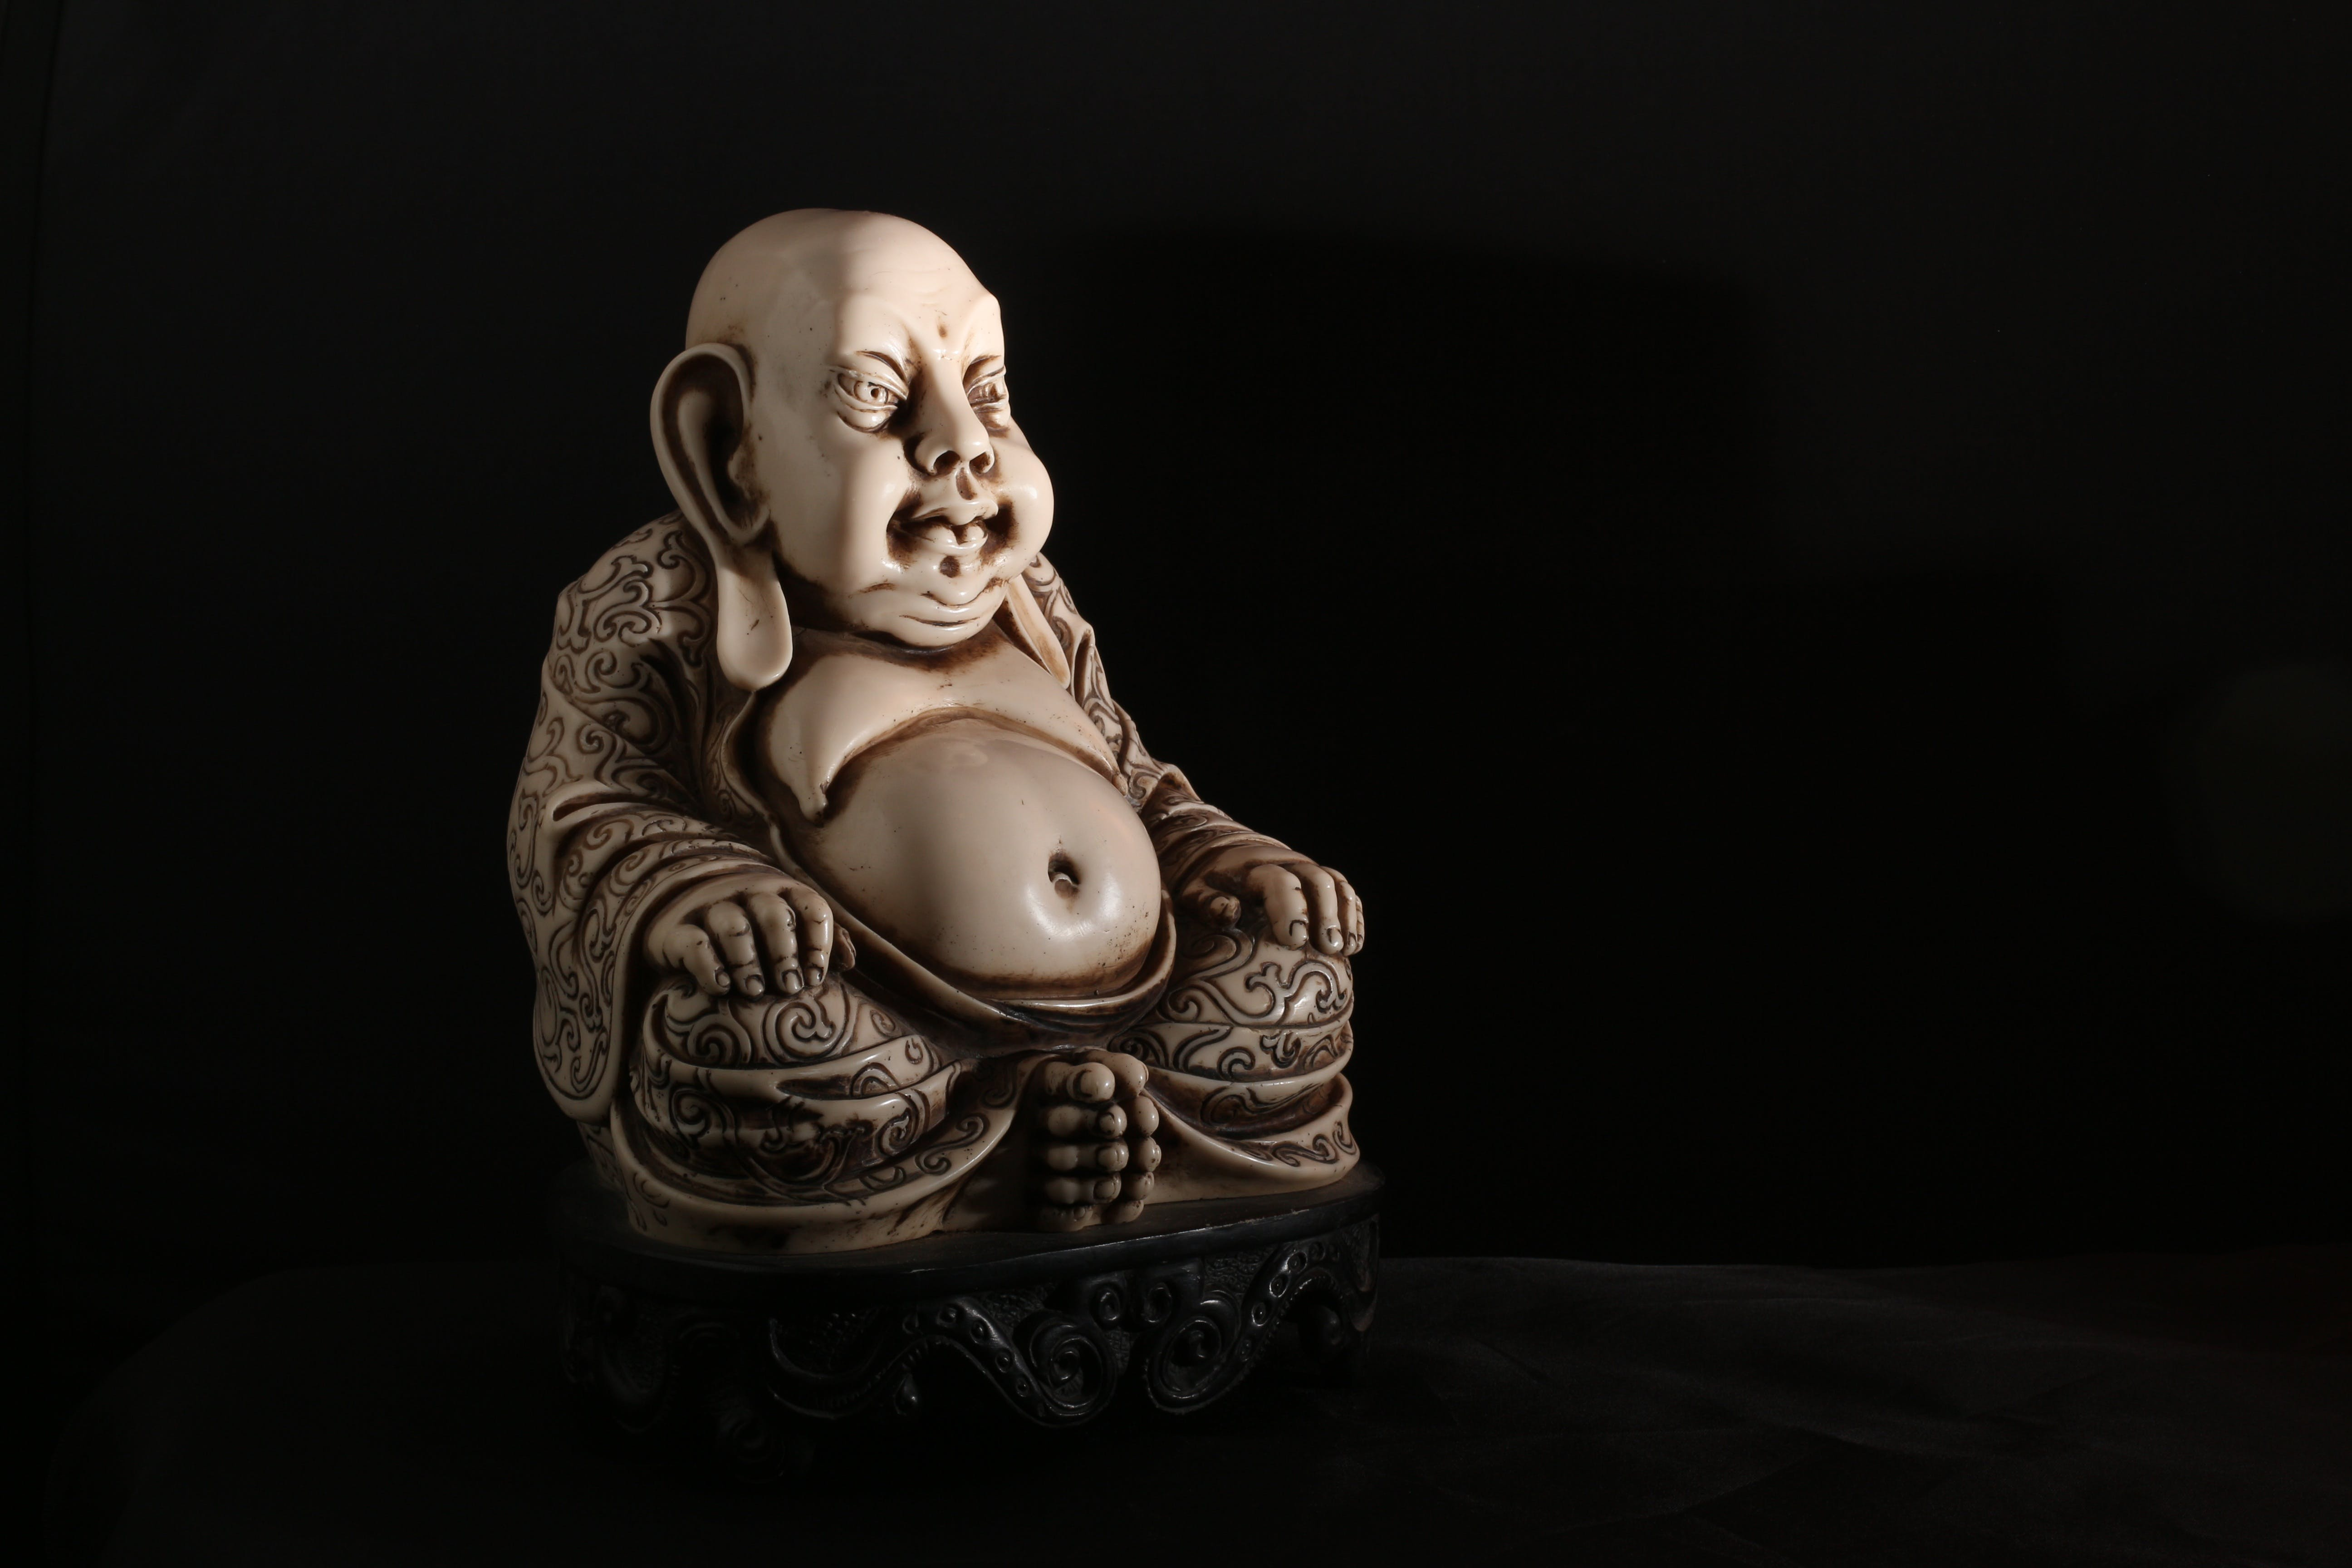 White Budah Figurine